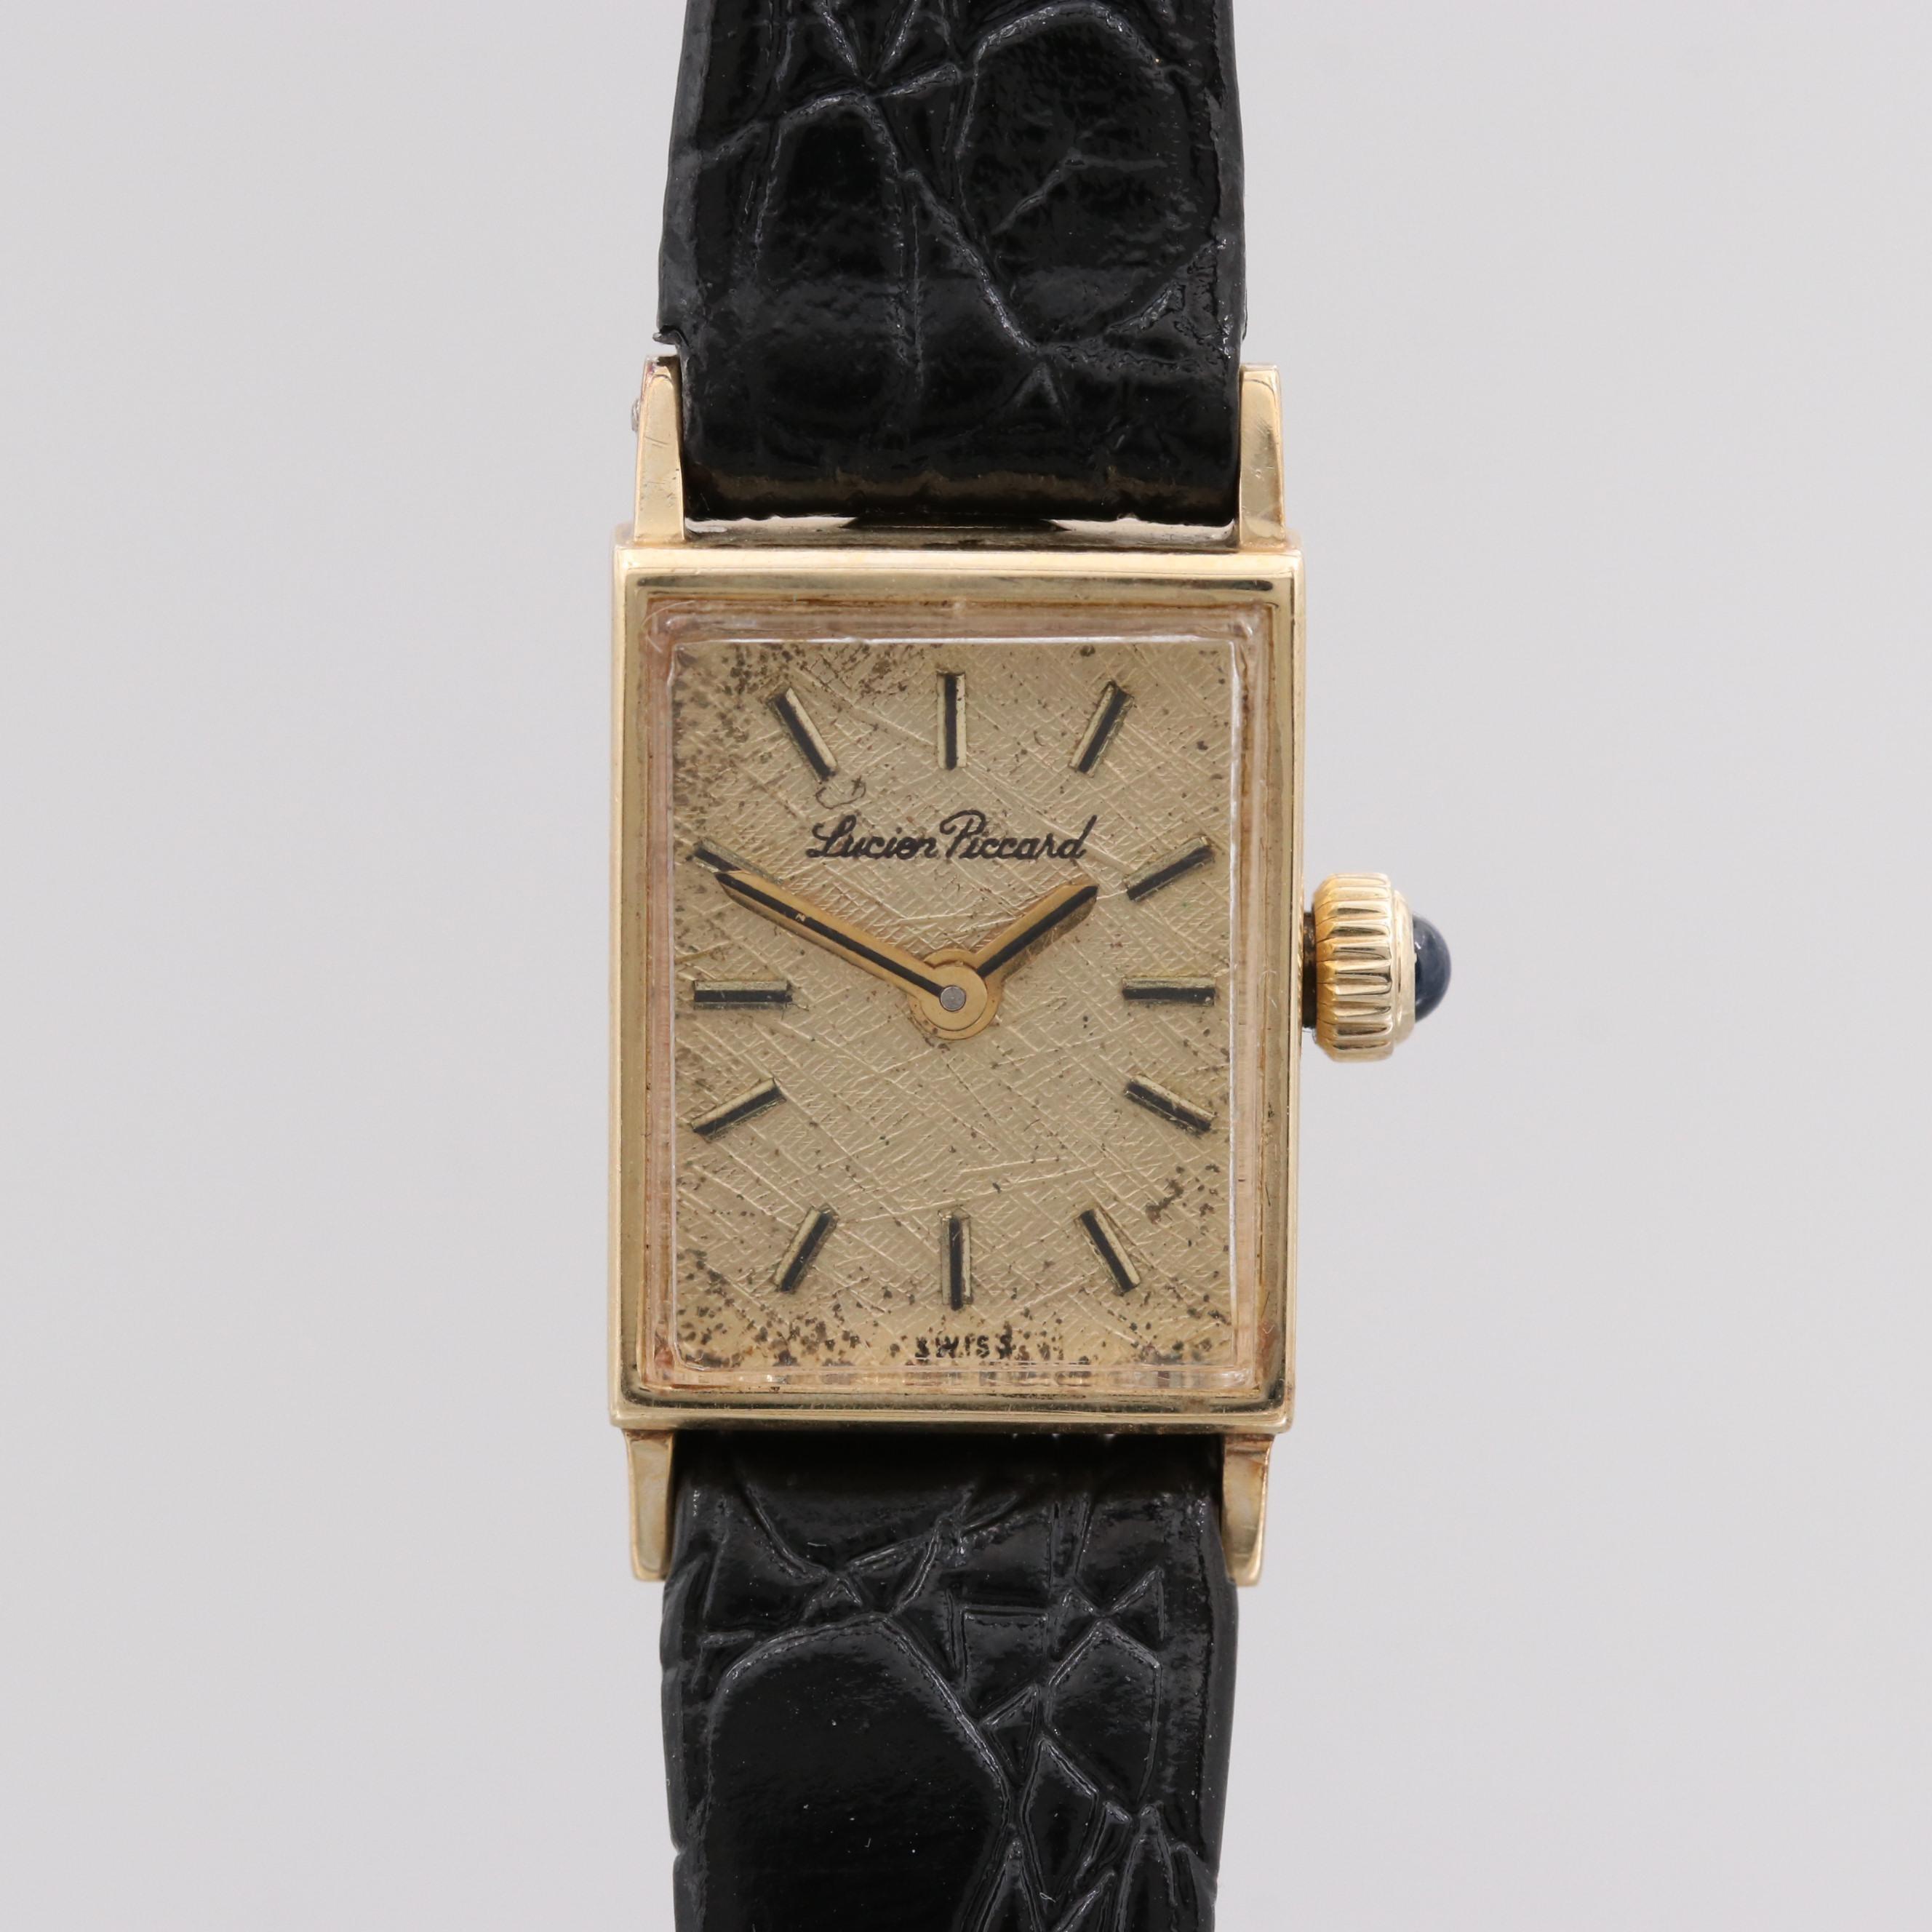 Vintage Lucien Piccard 14K Yellow Gold Stem Wind Wristwatch